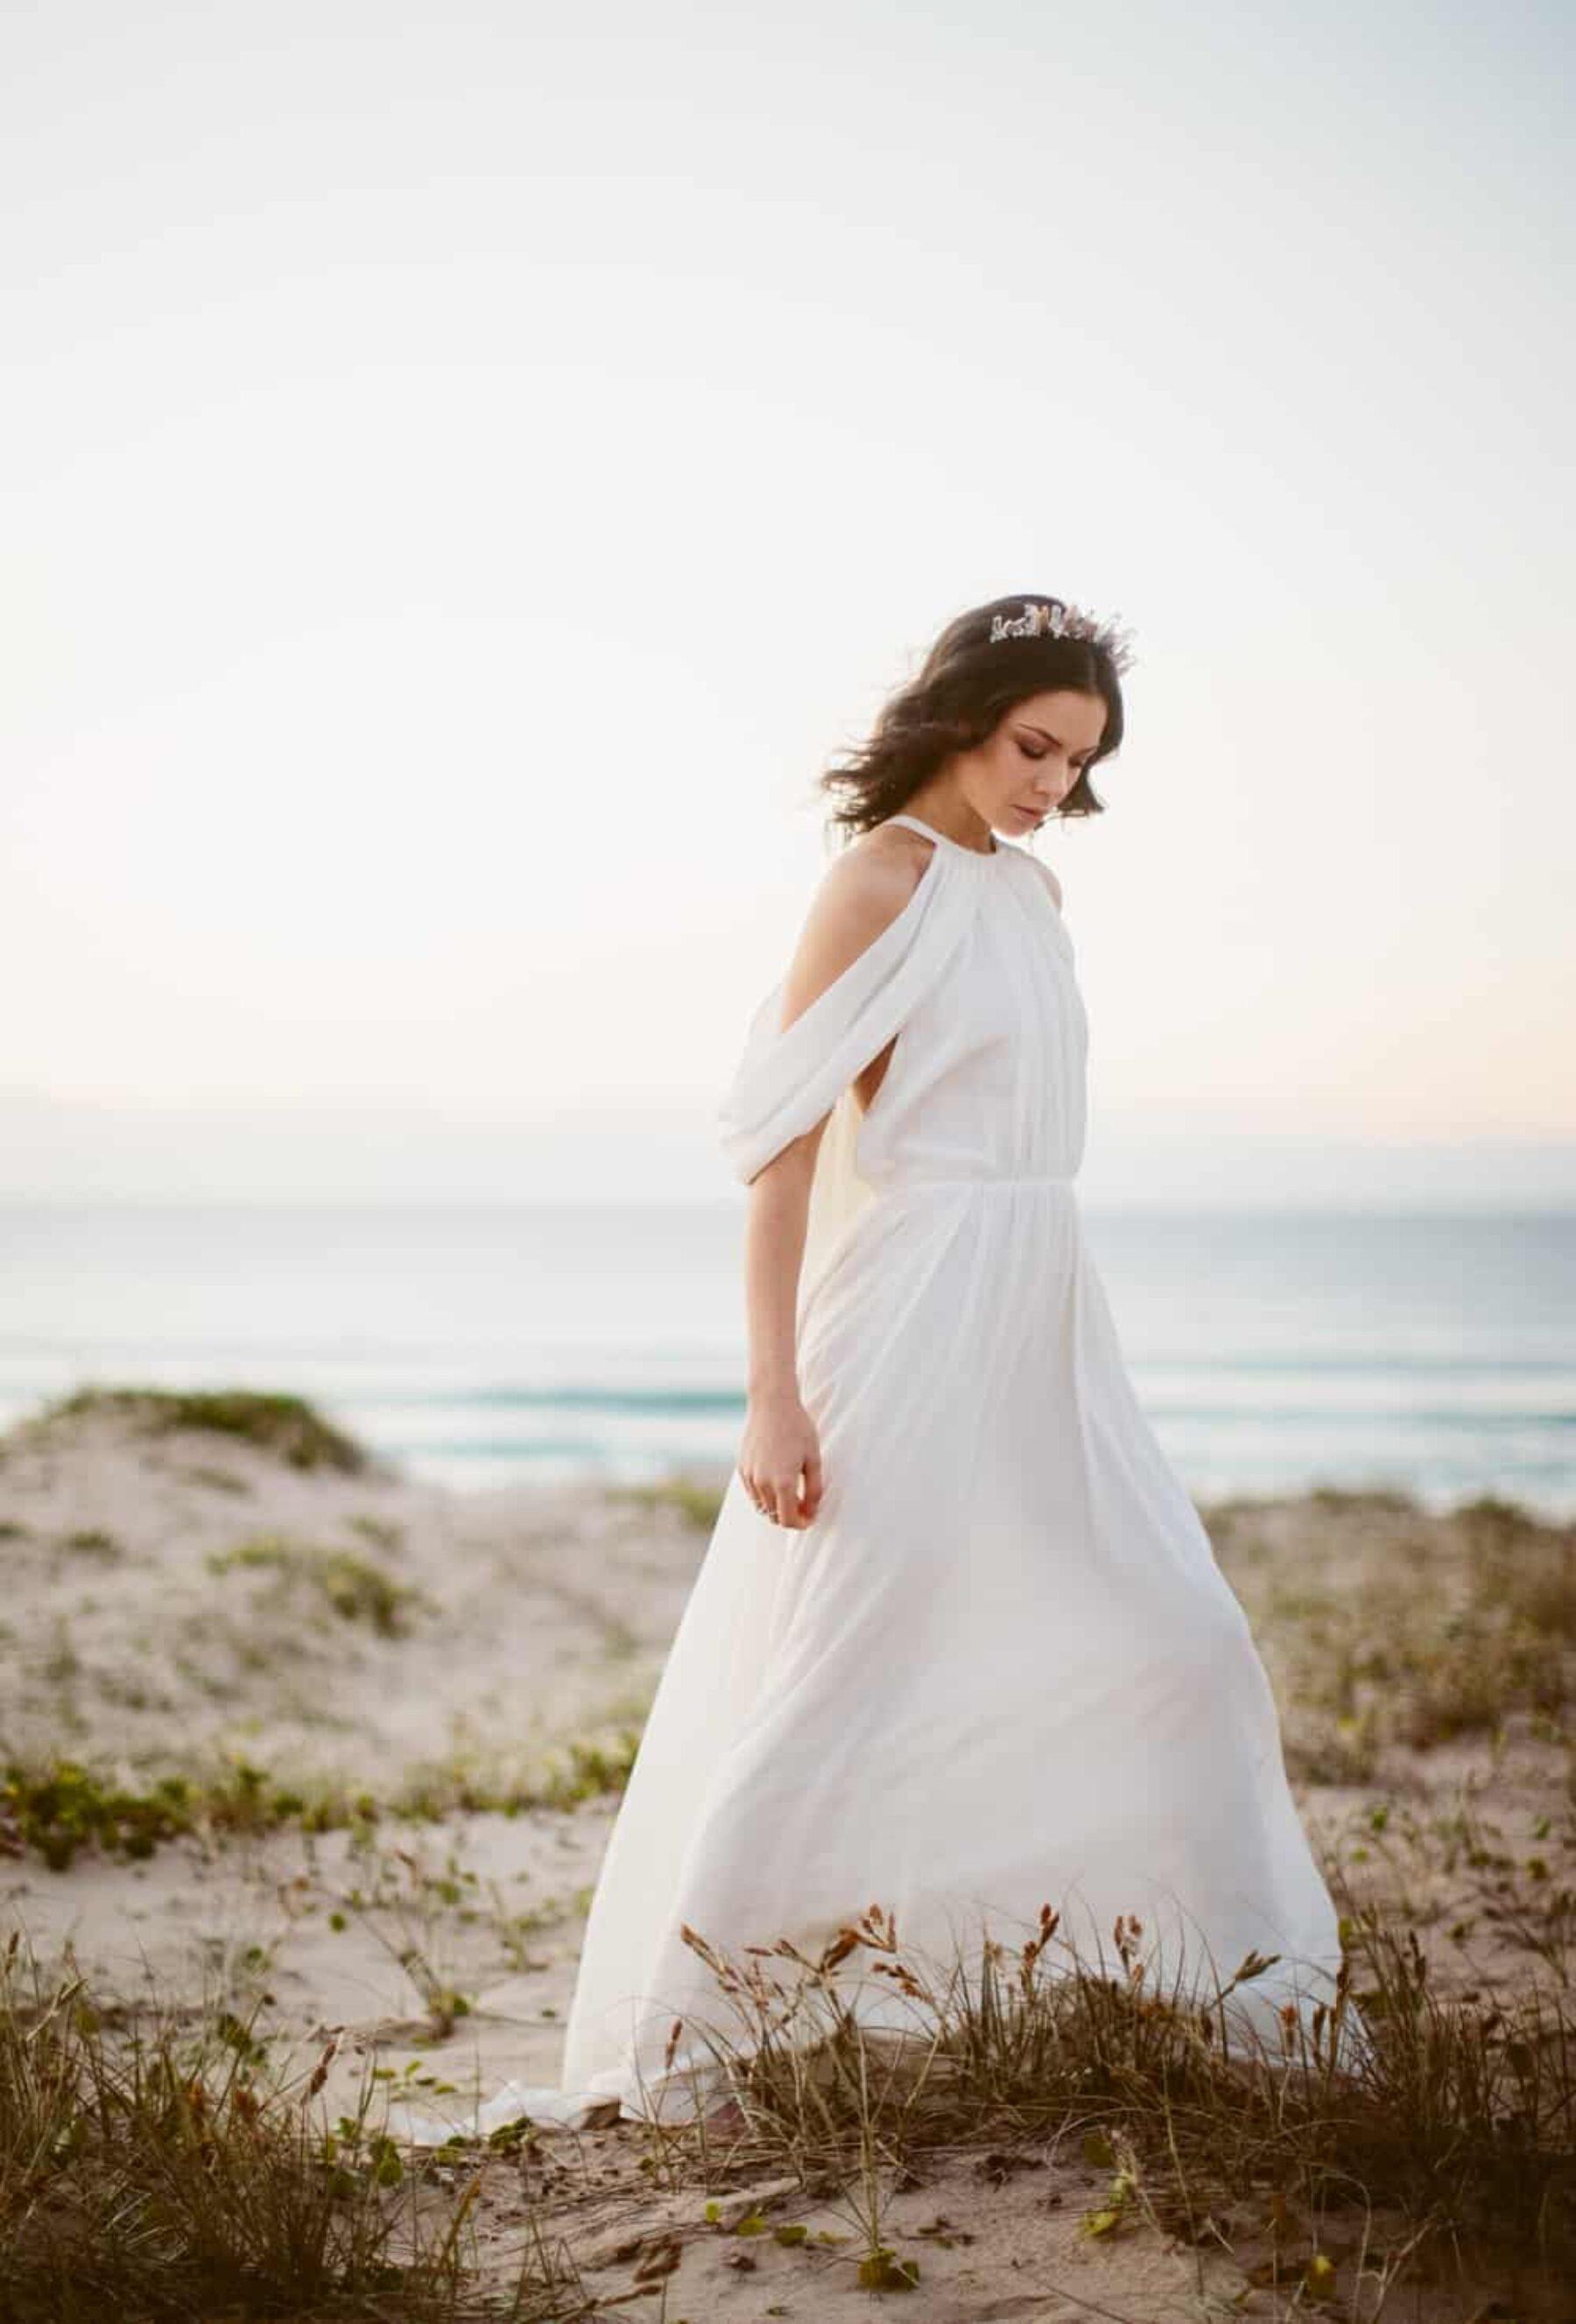 Grecian off-shoulder wedding dress by Odylyne the Ceremony